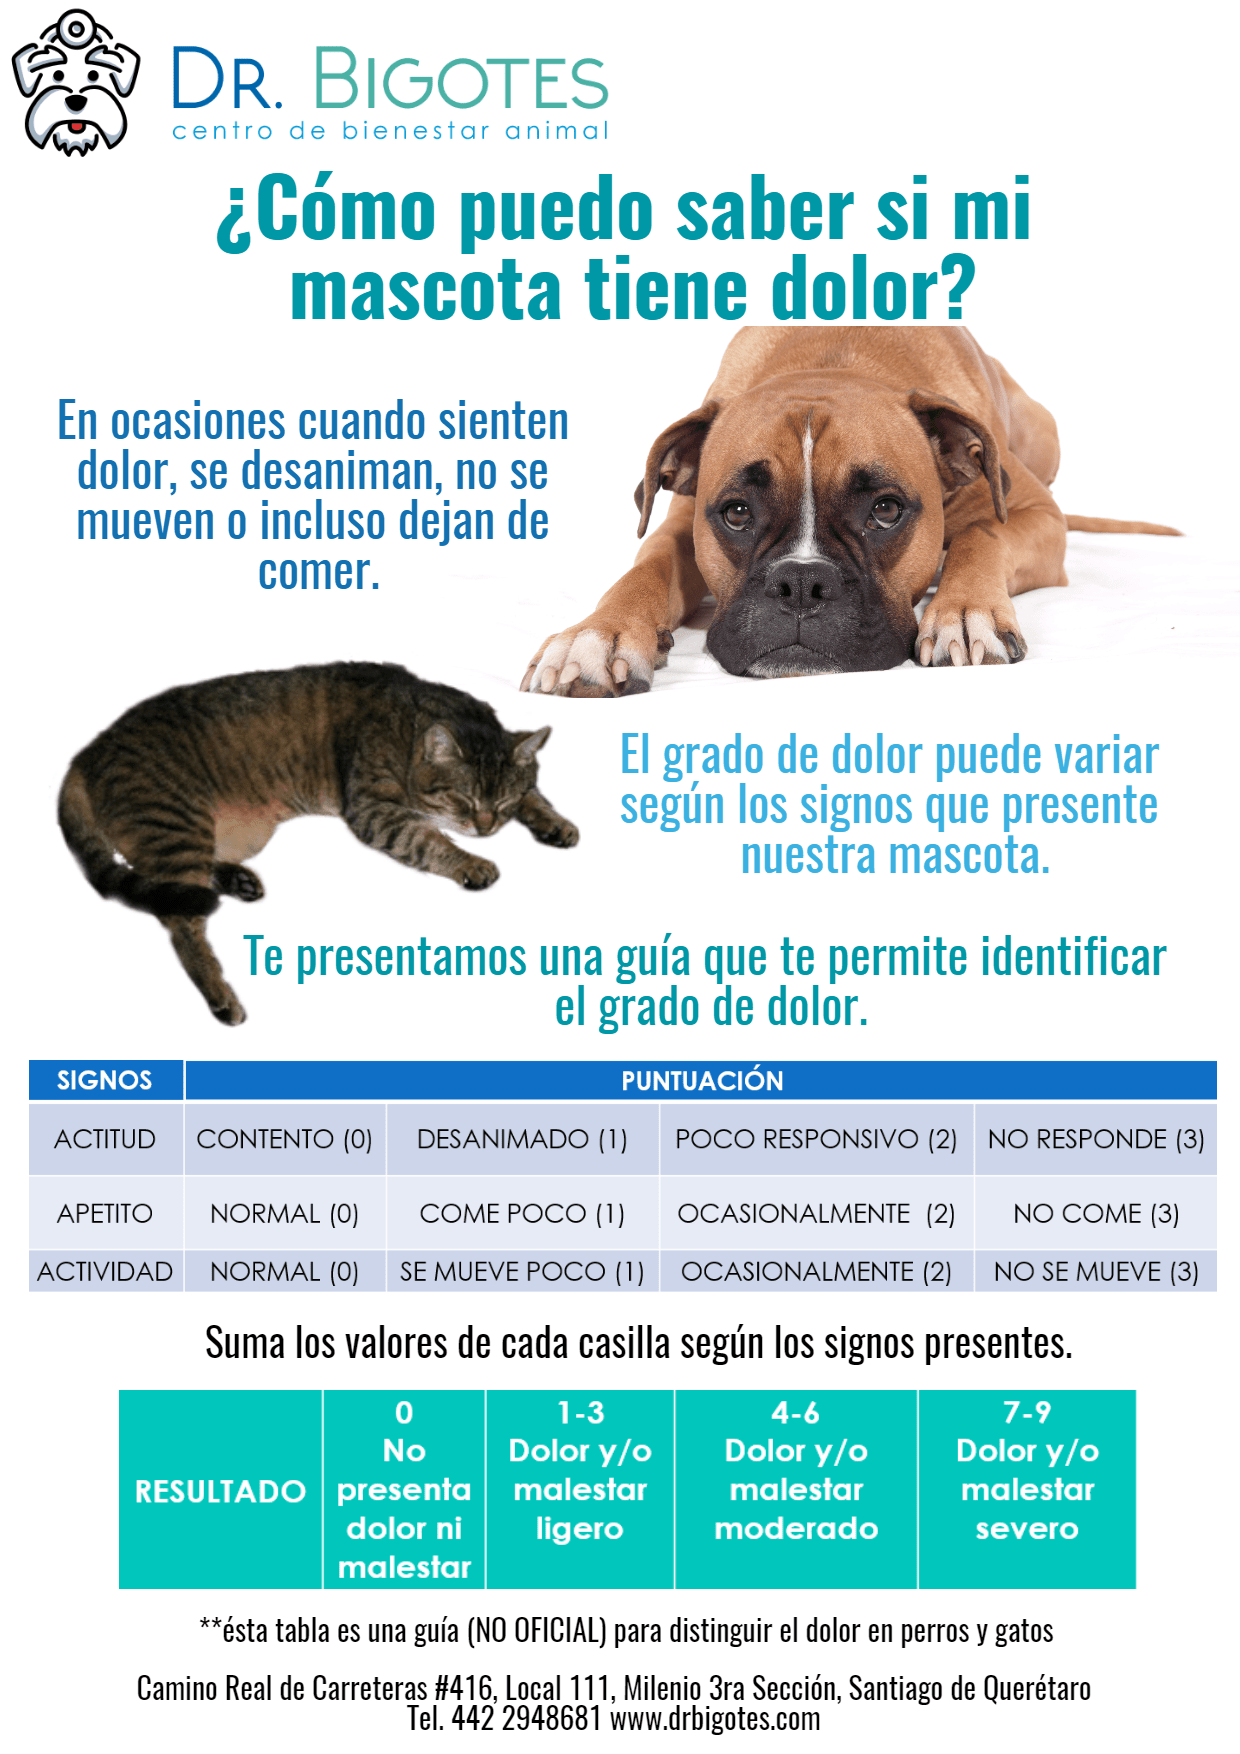 Dog,                Like,                Mammal,                Breed,                Puppy,                Carnivoran,                Snout,                Product,                Companion,                Font,                Graphics,                White,                Aqua,                 Free Image